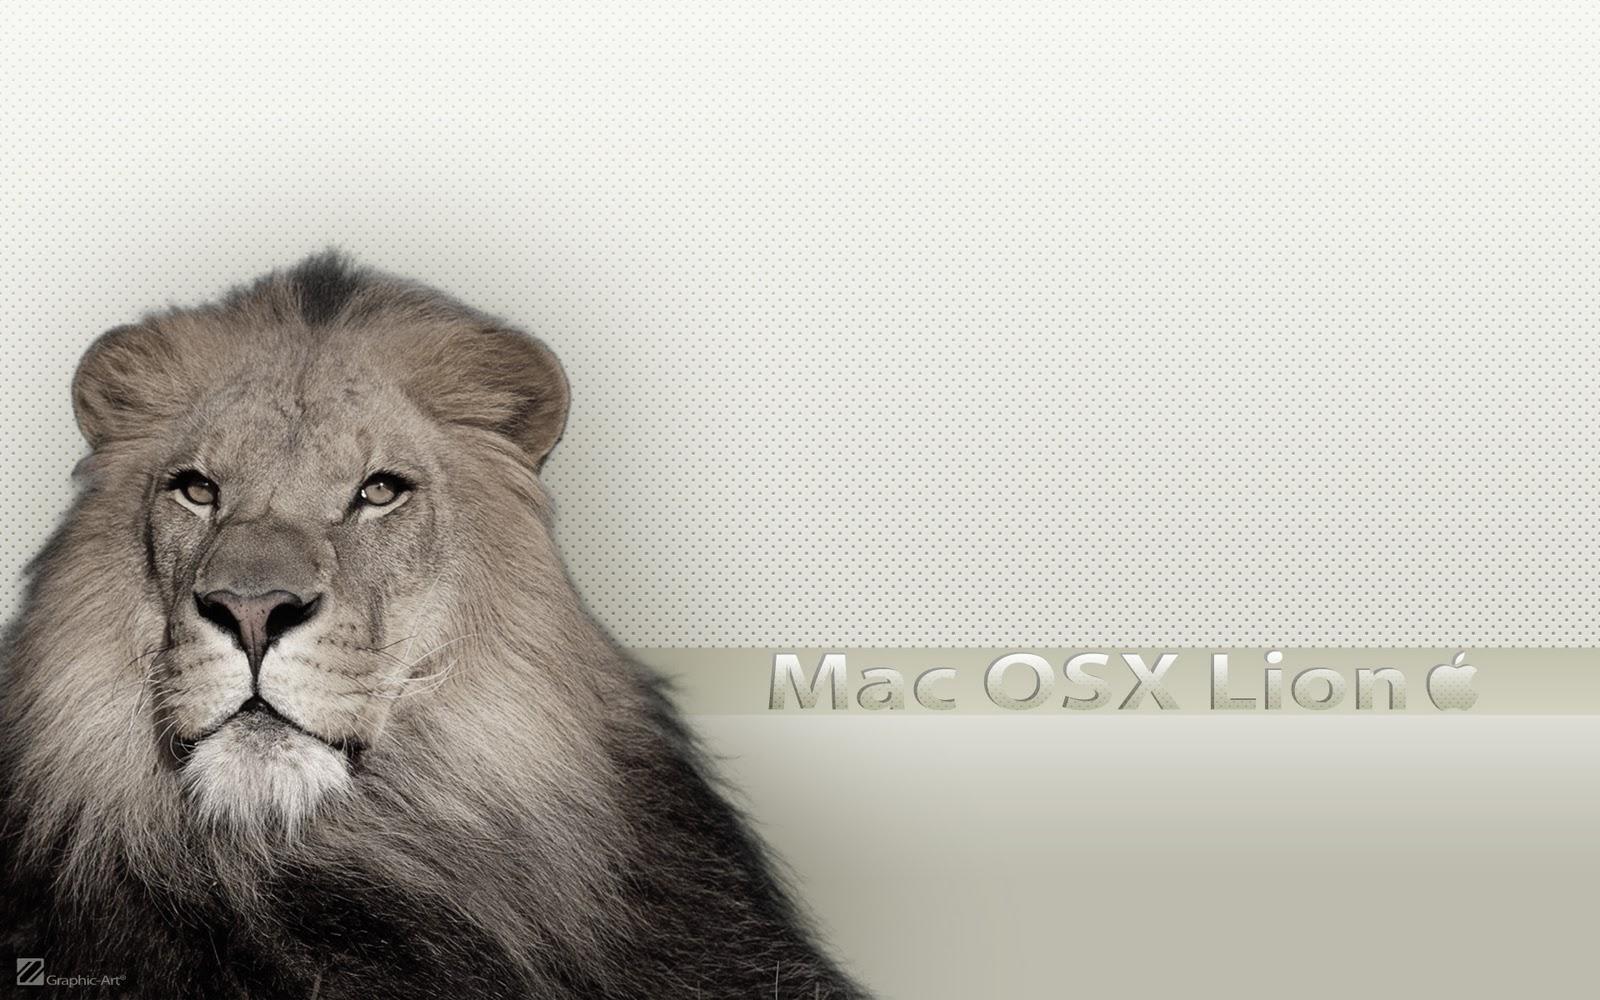 http://3.bp.blogspot.com/-4rPPa8o6LaI/TsuVJCTZkMI/AAAAAAAAA94/pIUk0vTQ-1E/s1600/Lion%2Bwallpapers%2Bmac%2B1.jpg